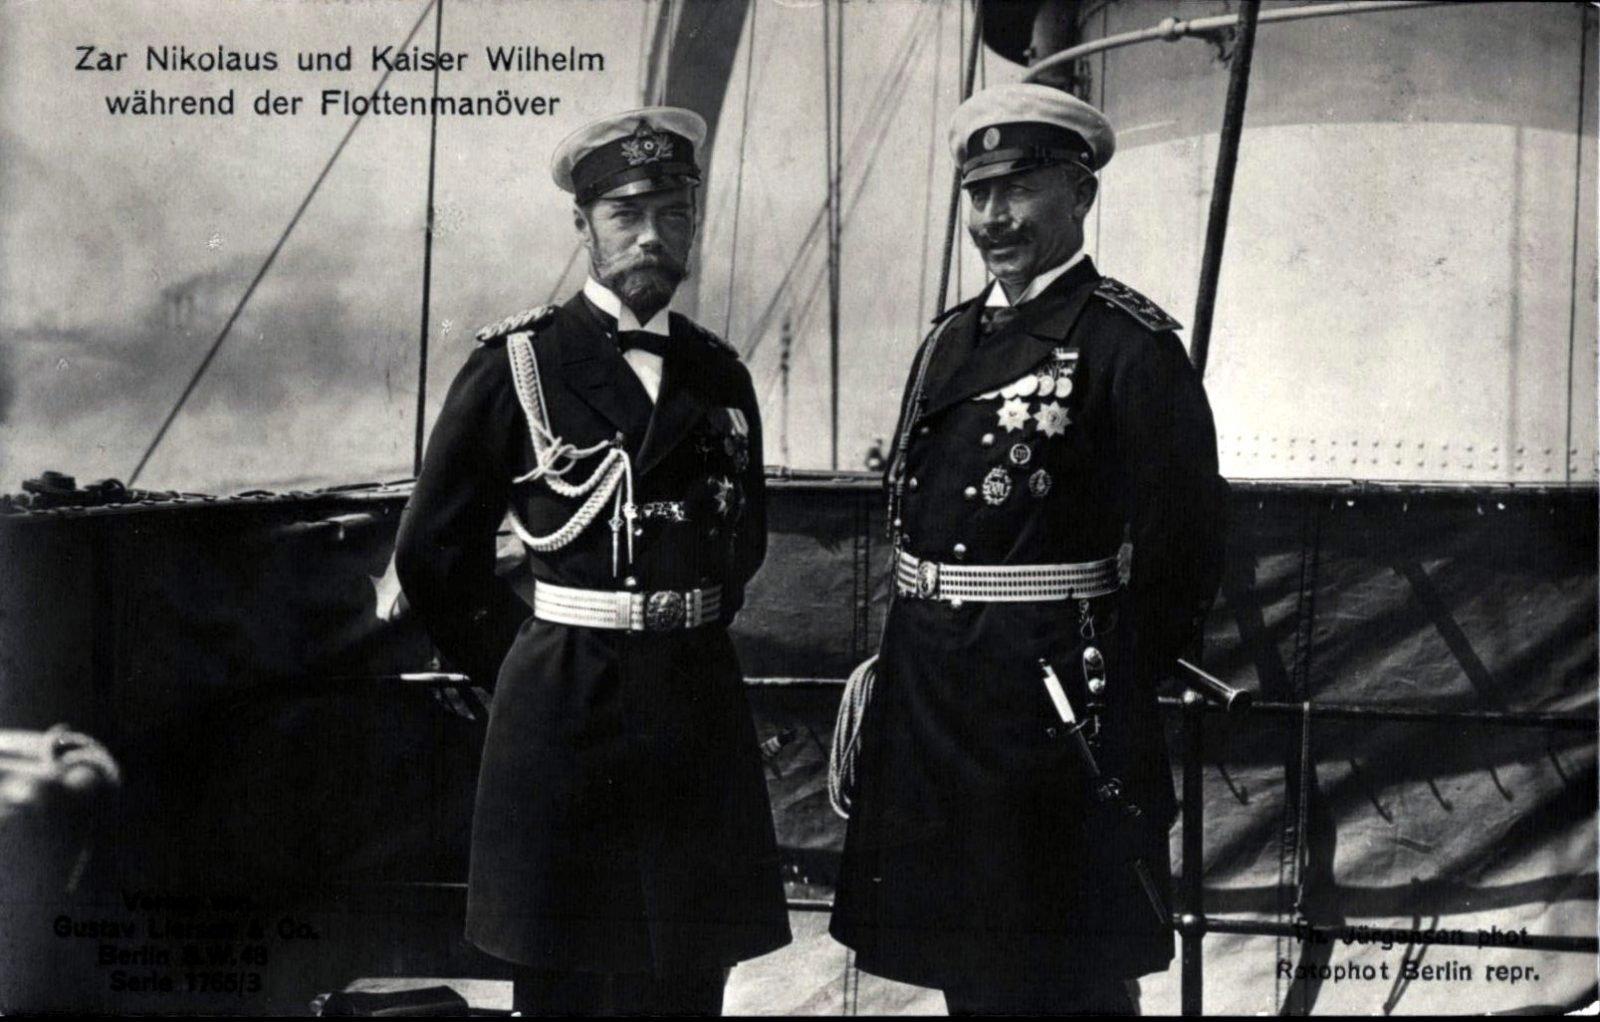 Царь Николай II и кайзер Вильгельм II